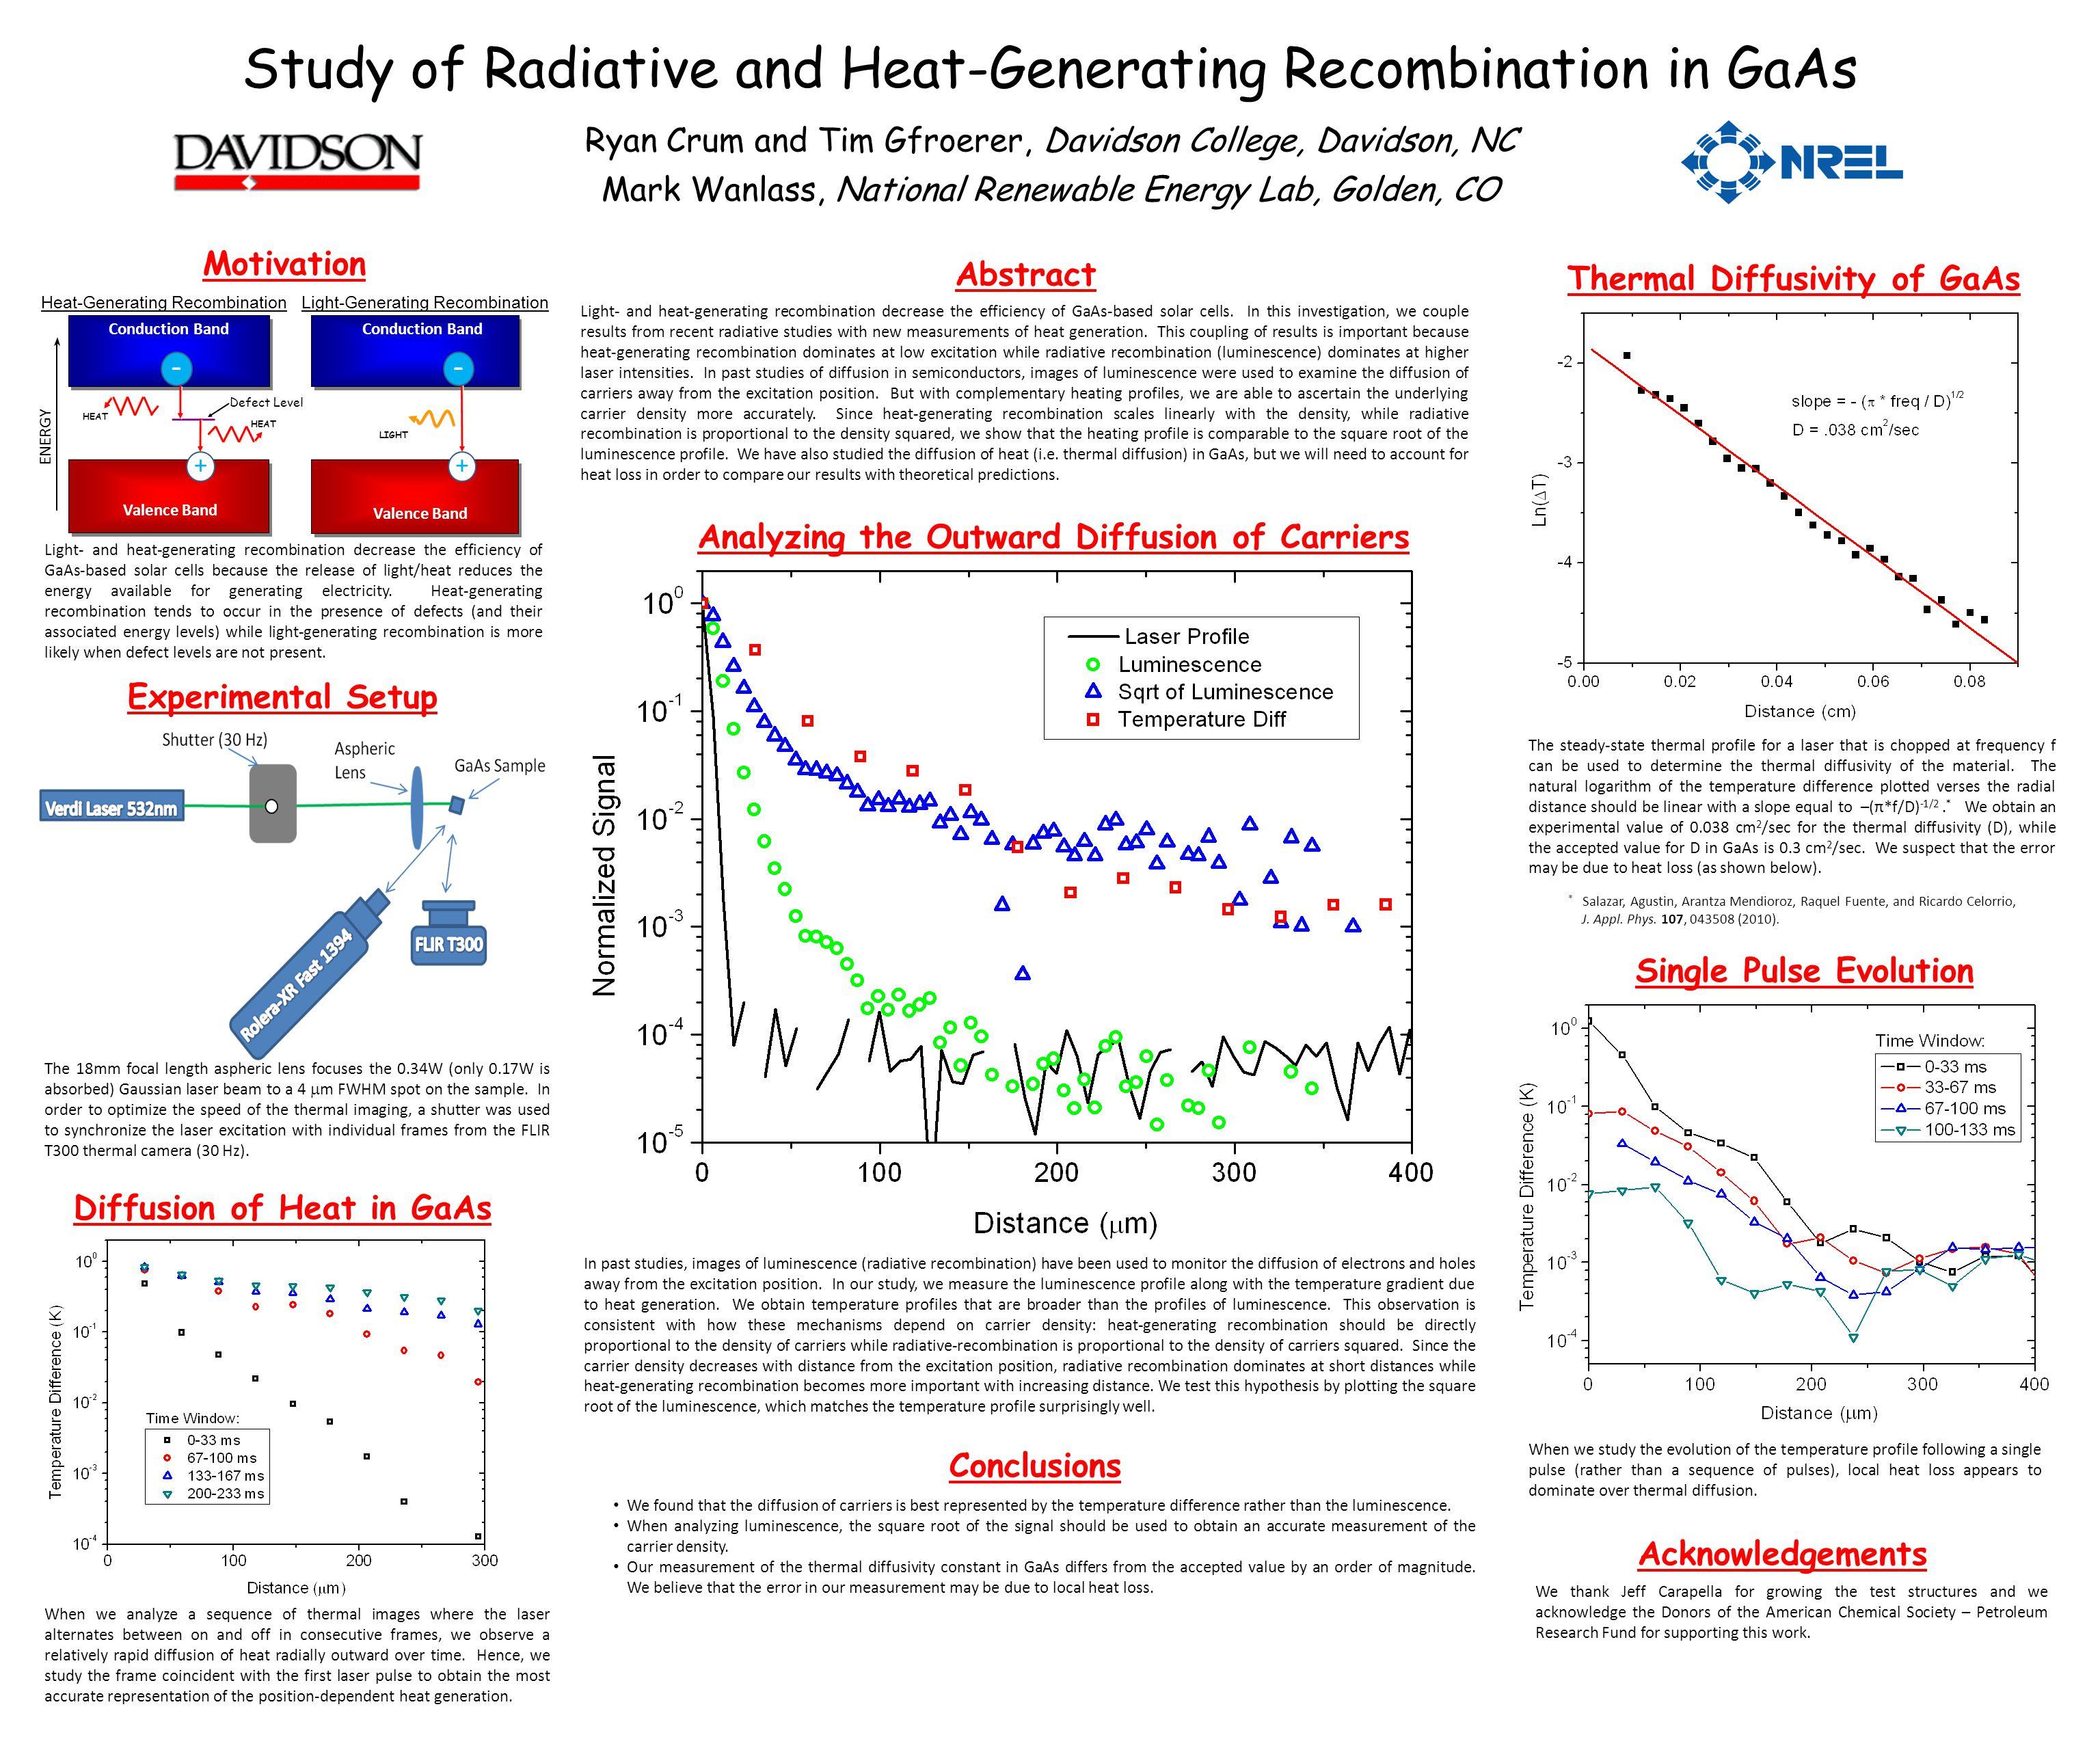 Study of Radiative and Heat-Generating Recombination in GaAs Ryan ...